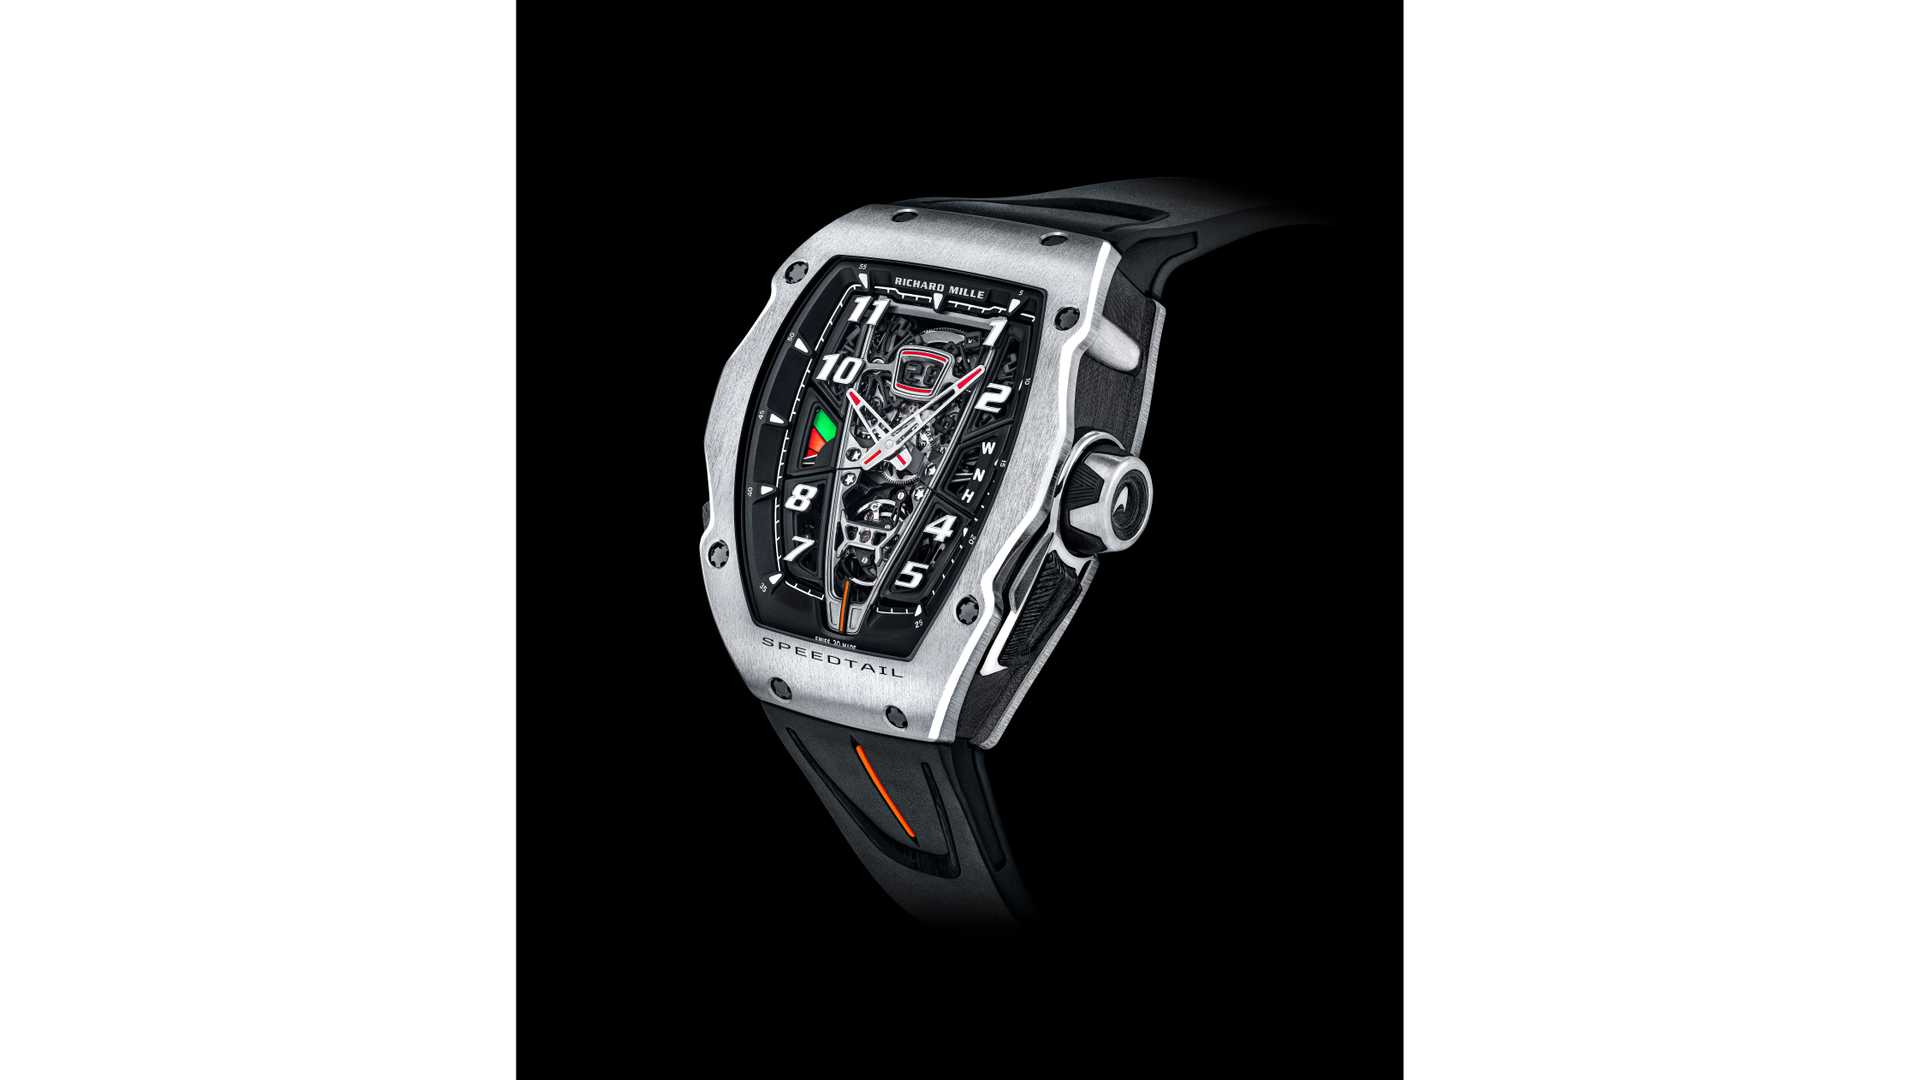 McLaren Speedtail Richard Mille RM 40-01 Watch Full Size